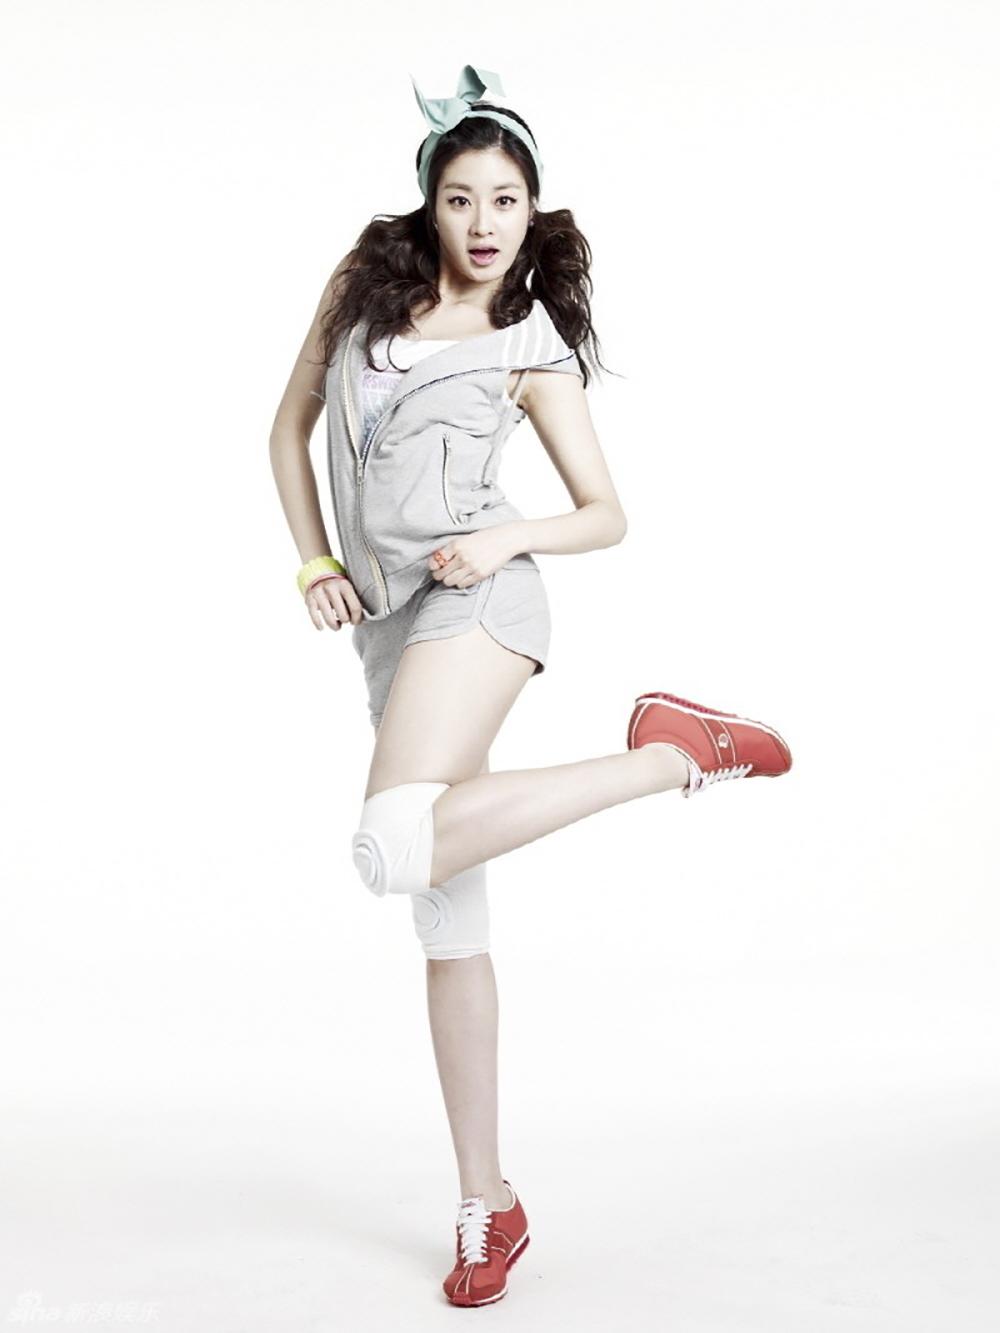 kang-sora-shows-off-her-preppy-look-for-k-swiss